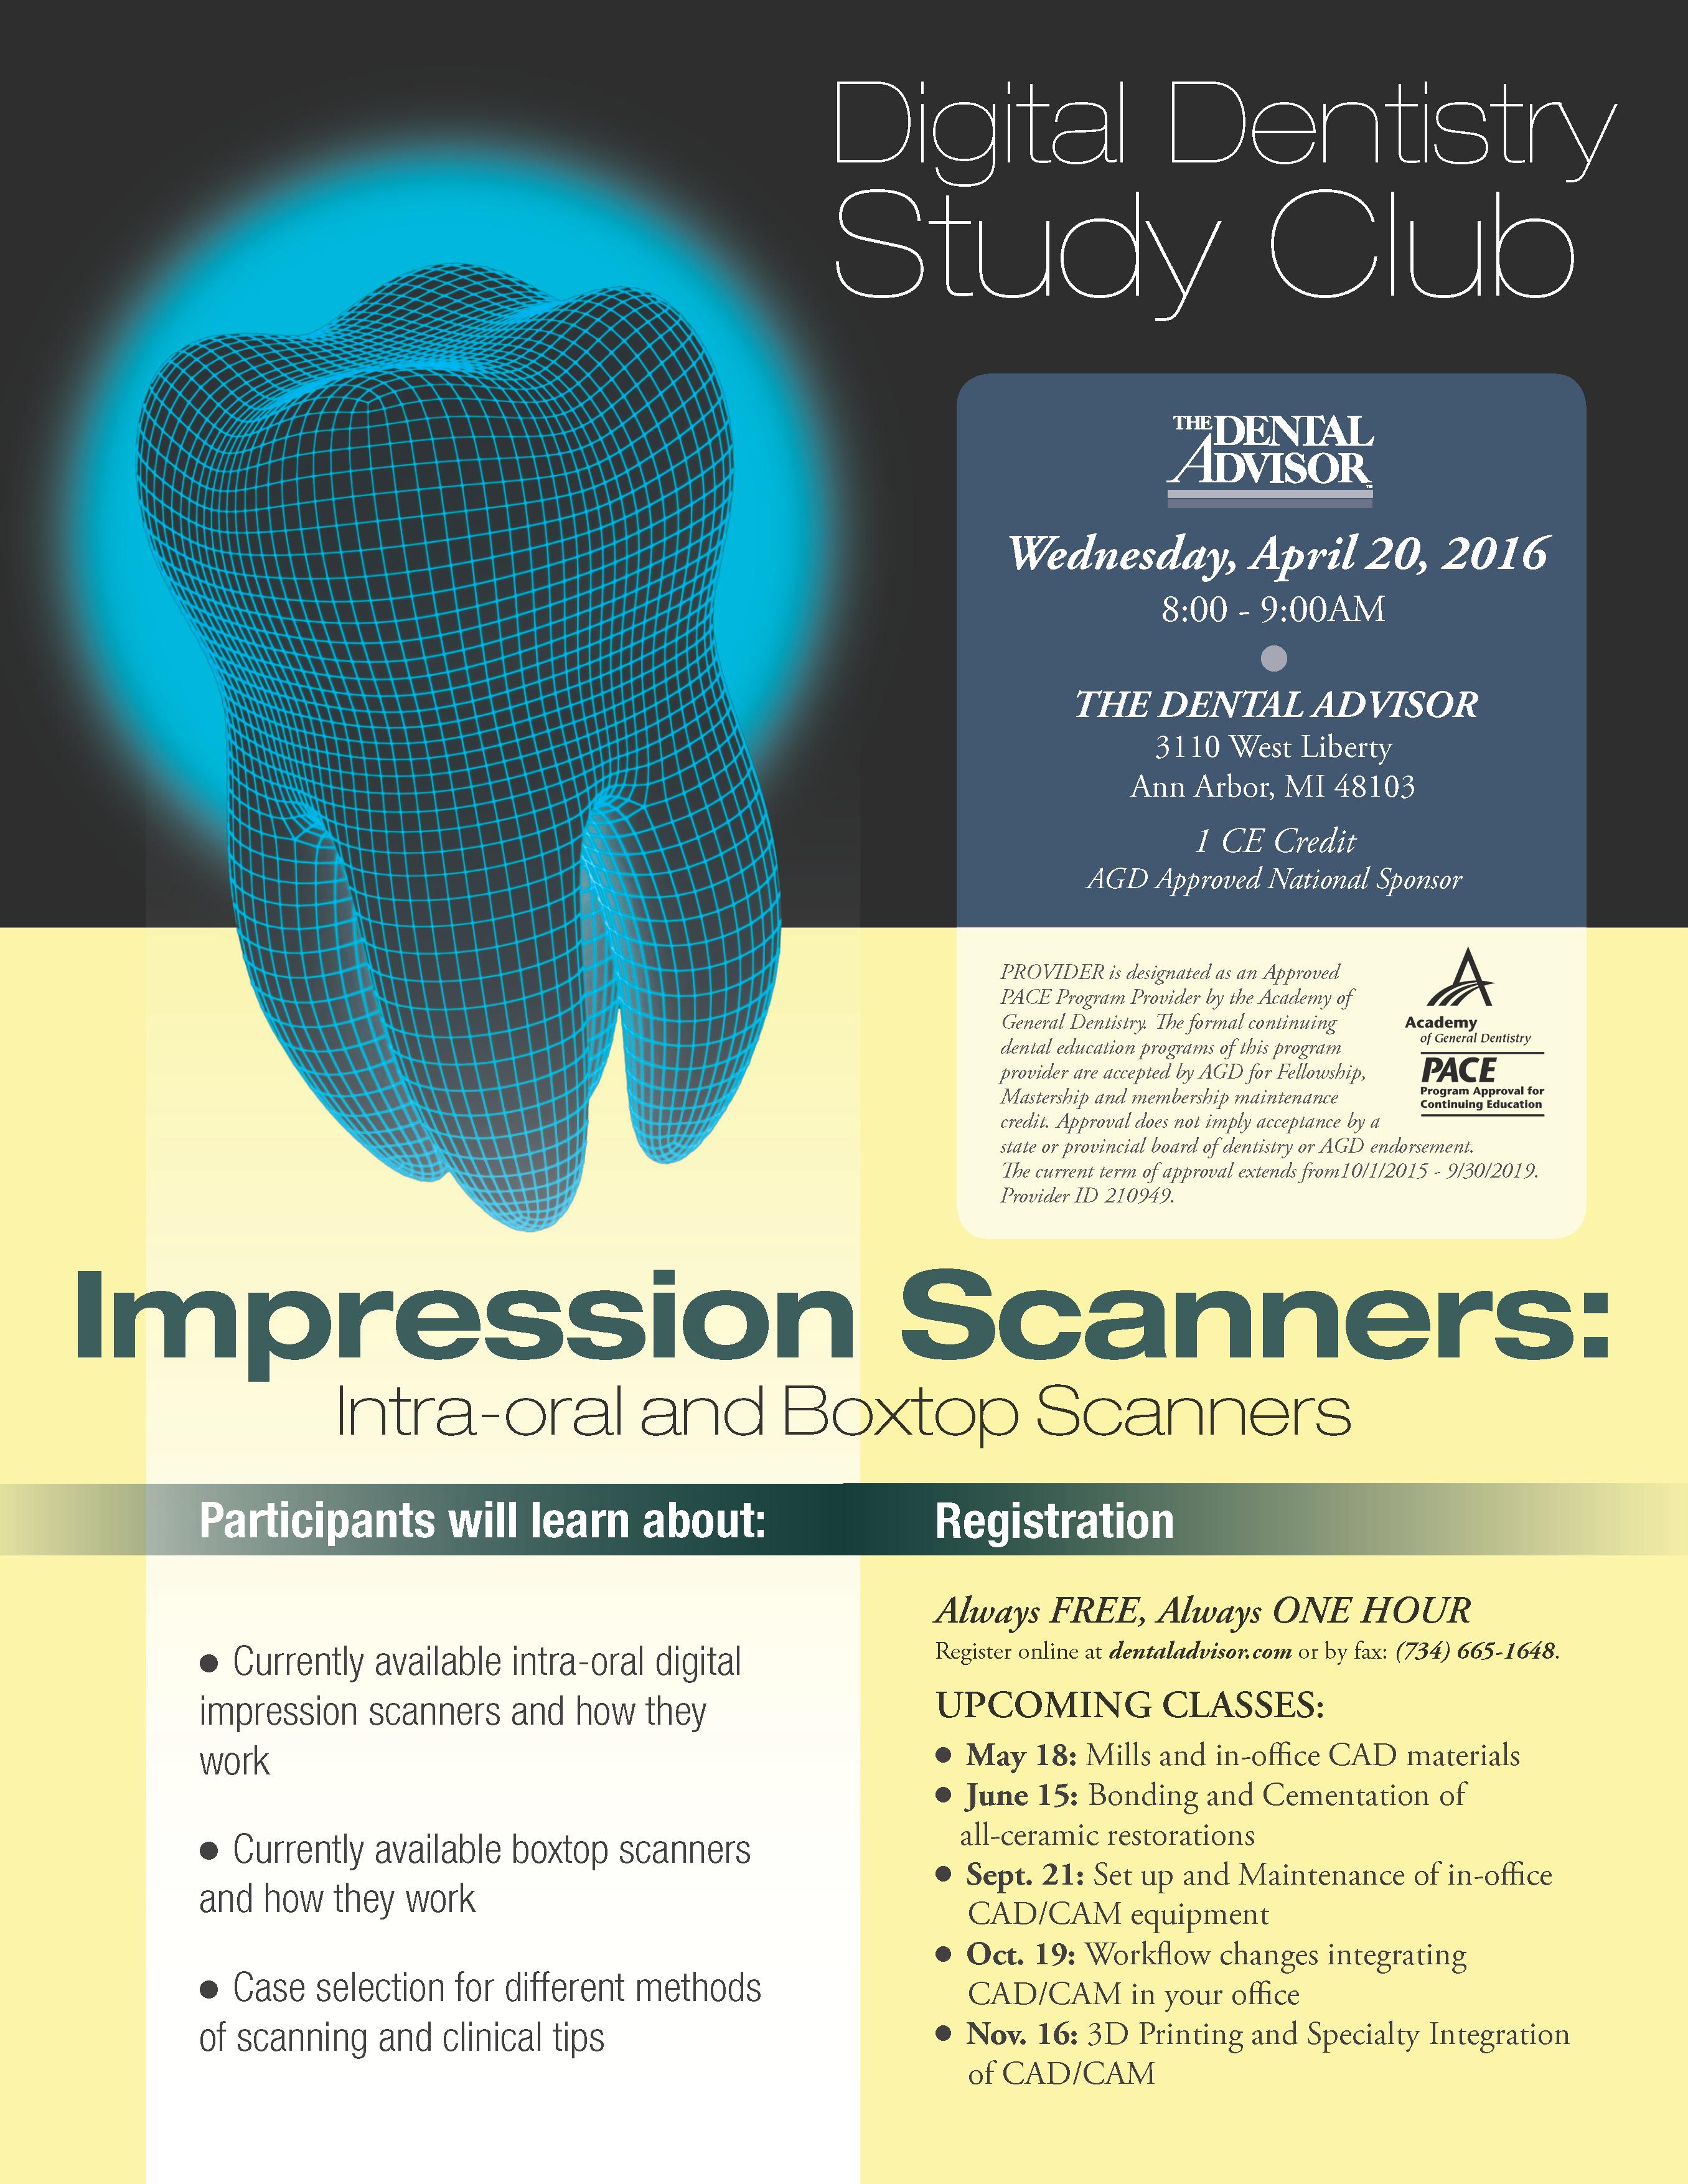 Dental Study Clubs | Inside Dentistry